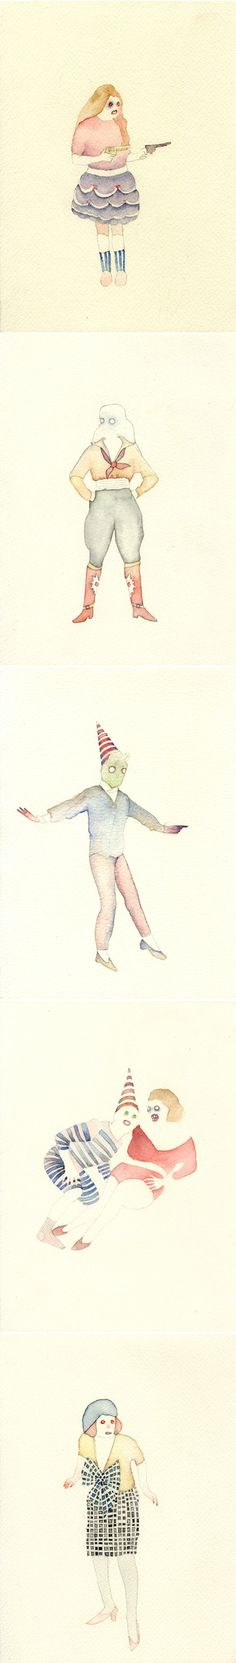 watercolors by tara marynowsky... beautiful/scary